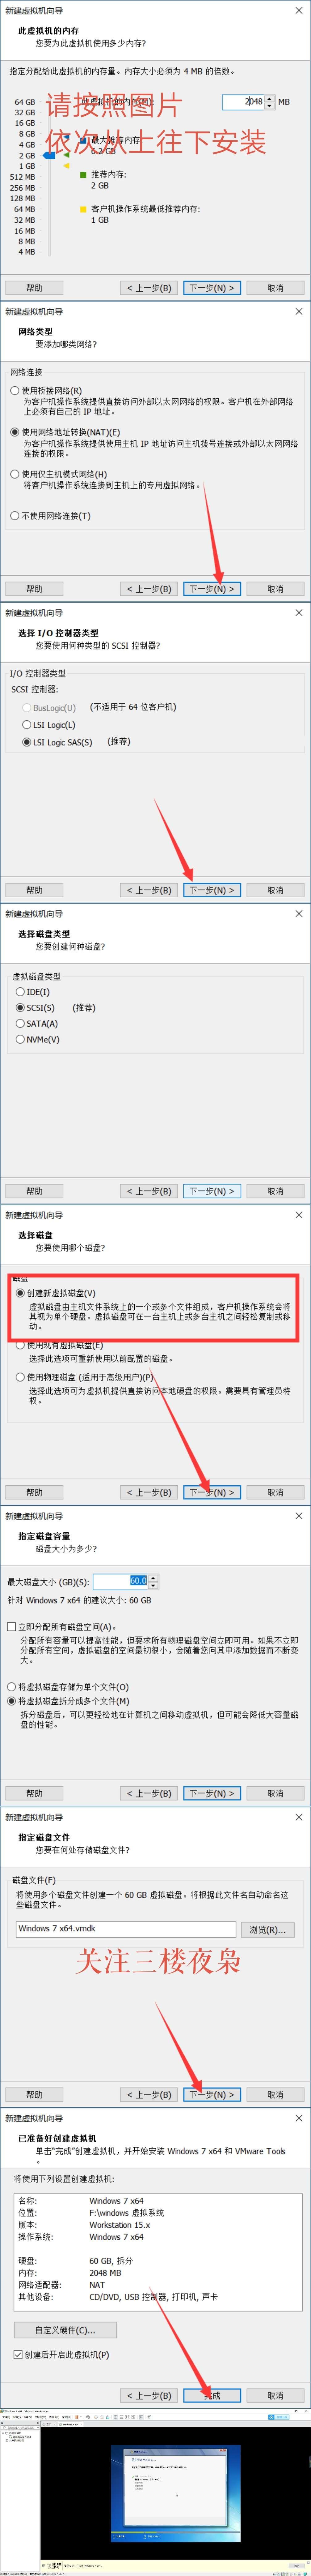 【PC】虚拟机安装win7系统-爱小助